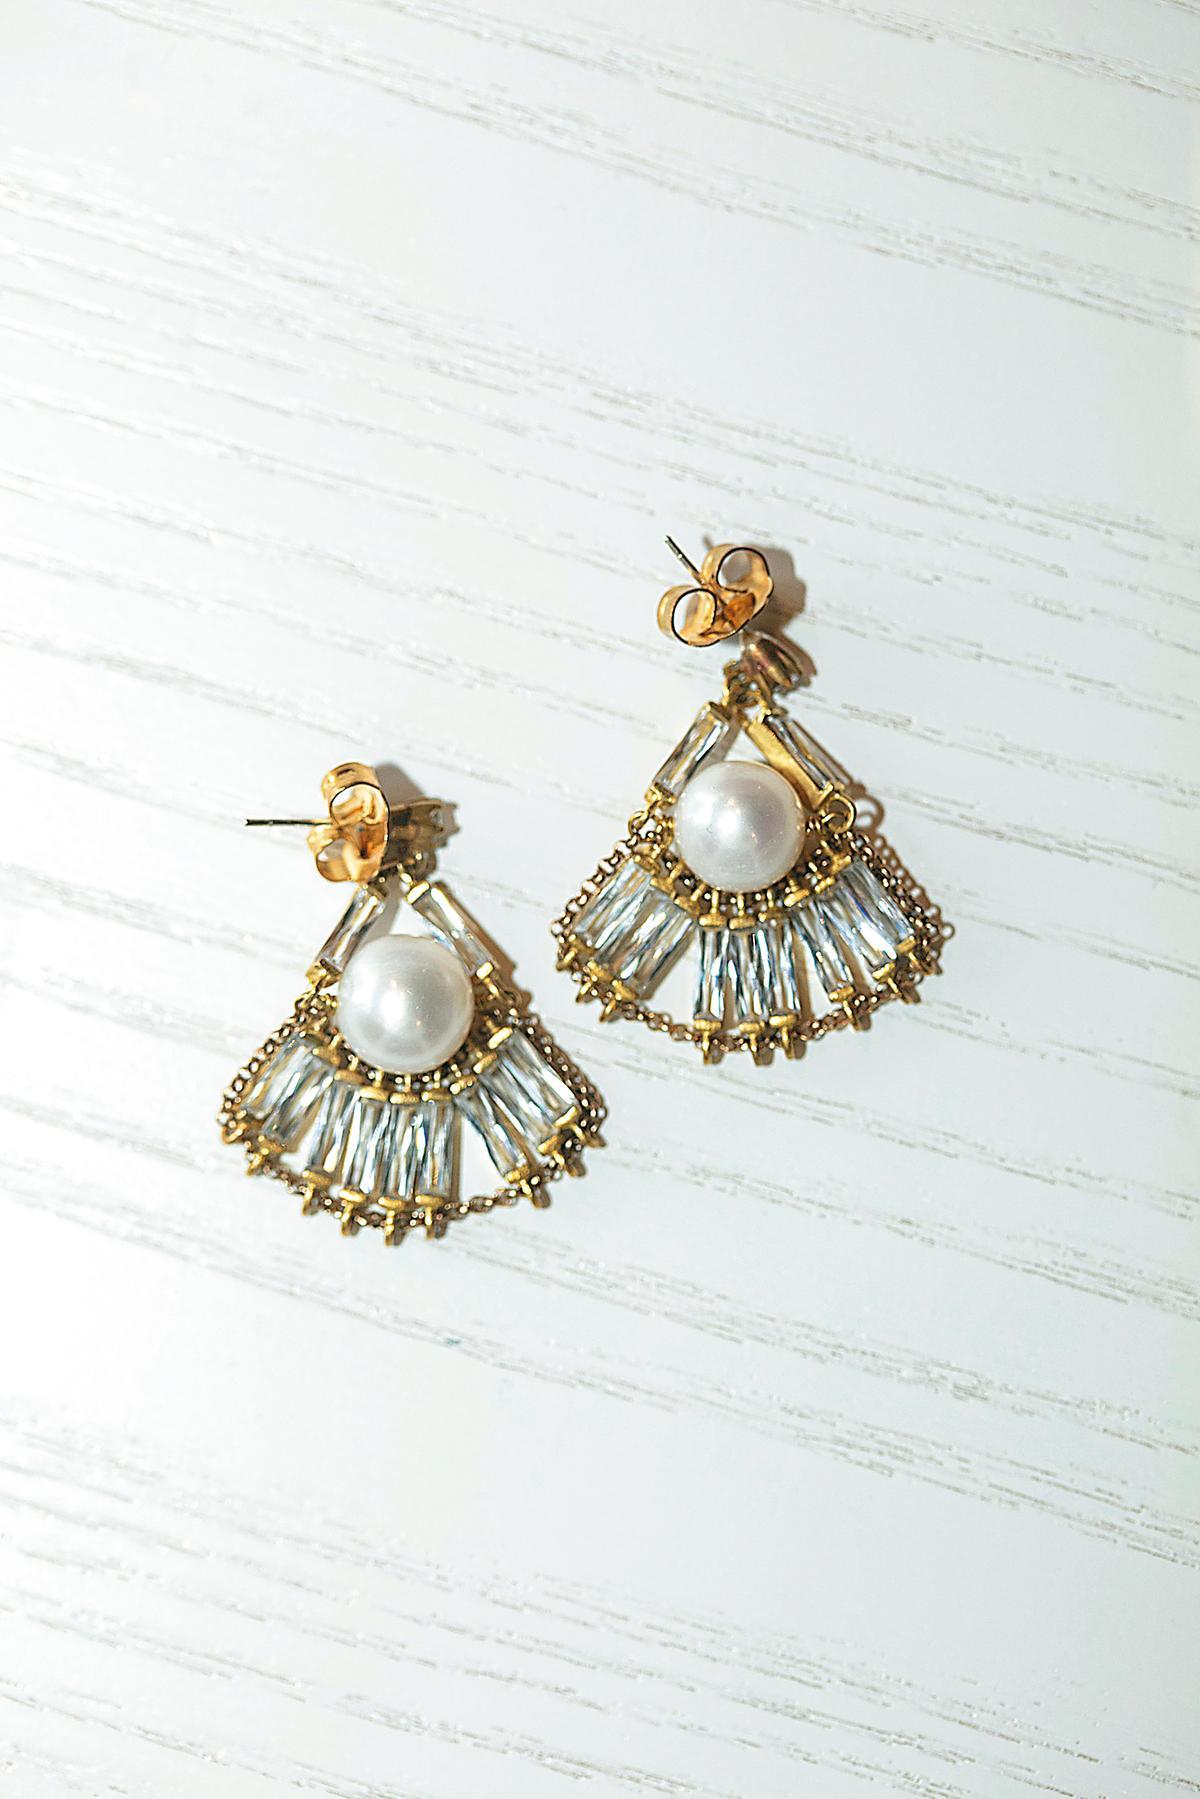 耳環,momo's march珍珠與長方鑽手工傘形耳環。NT$4,980